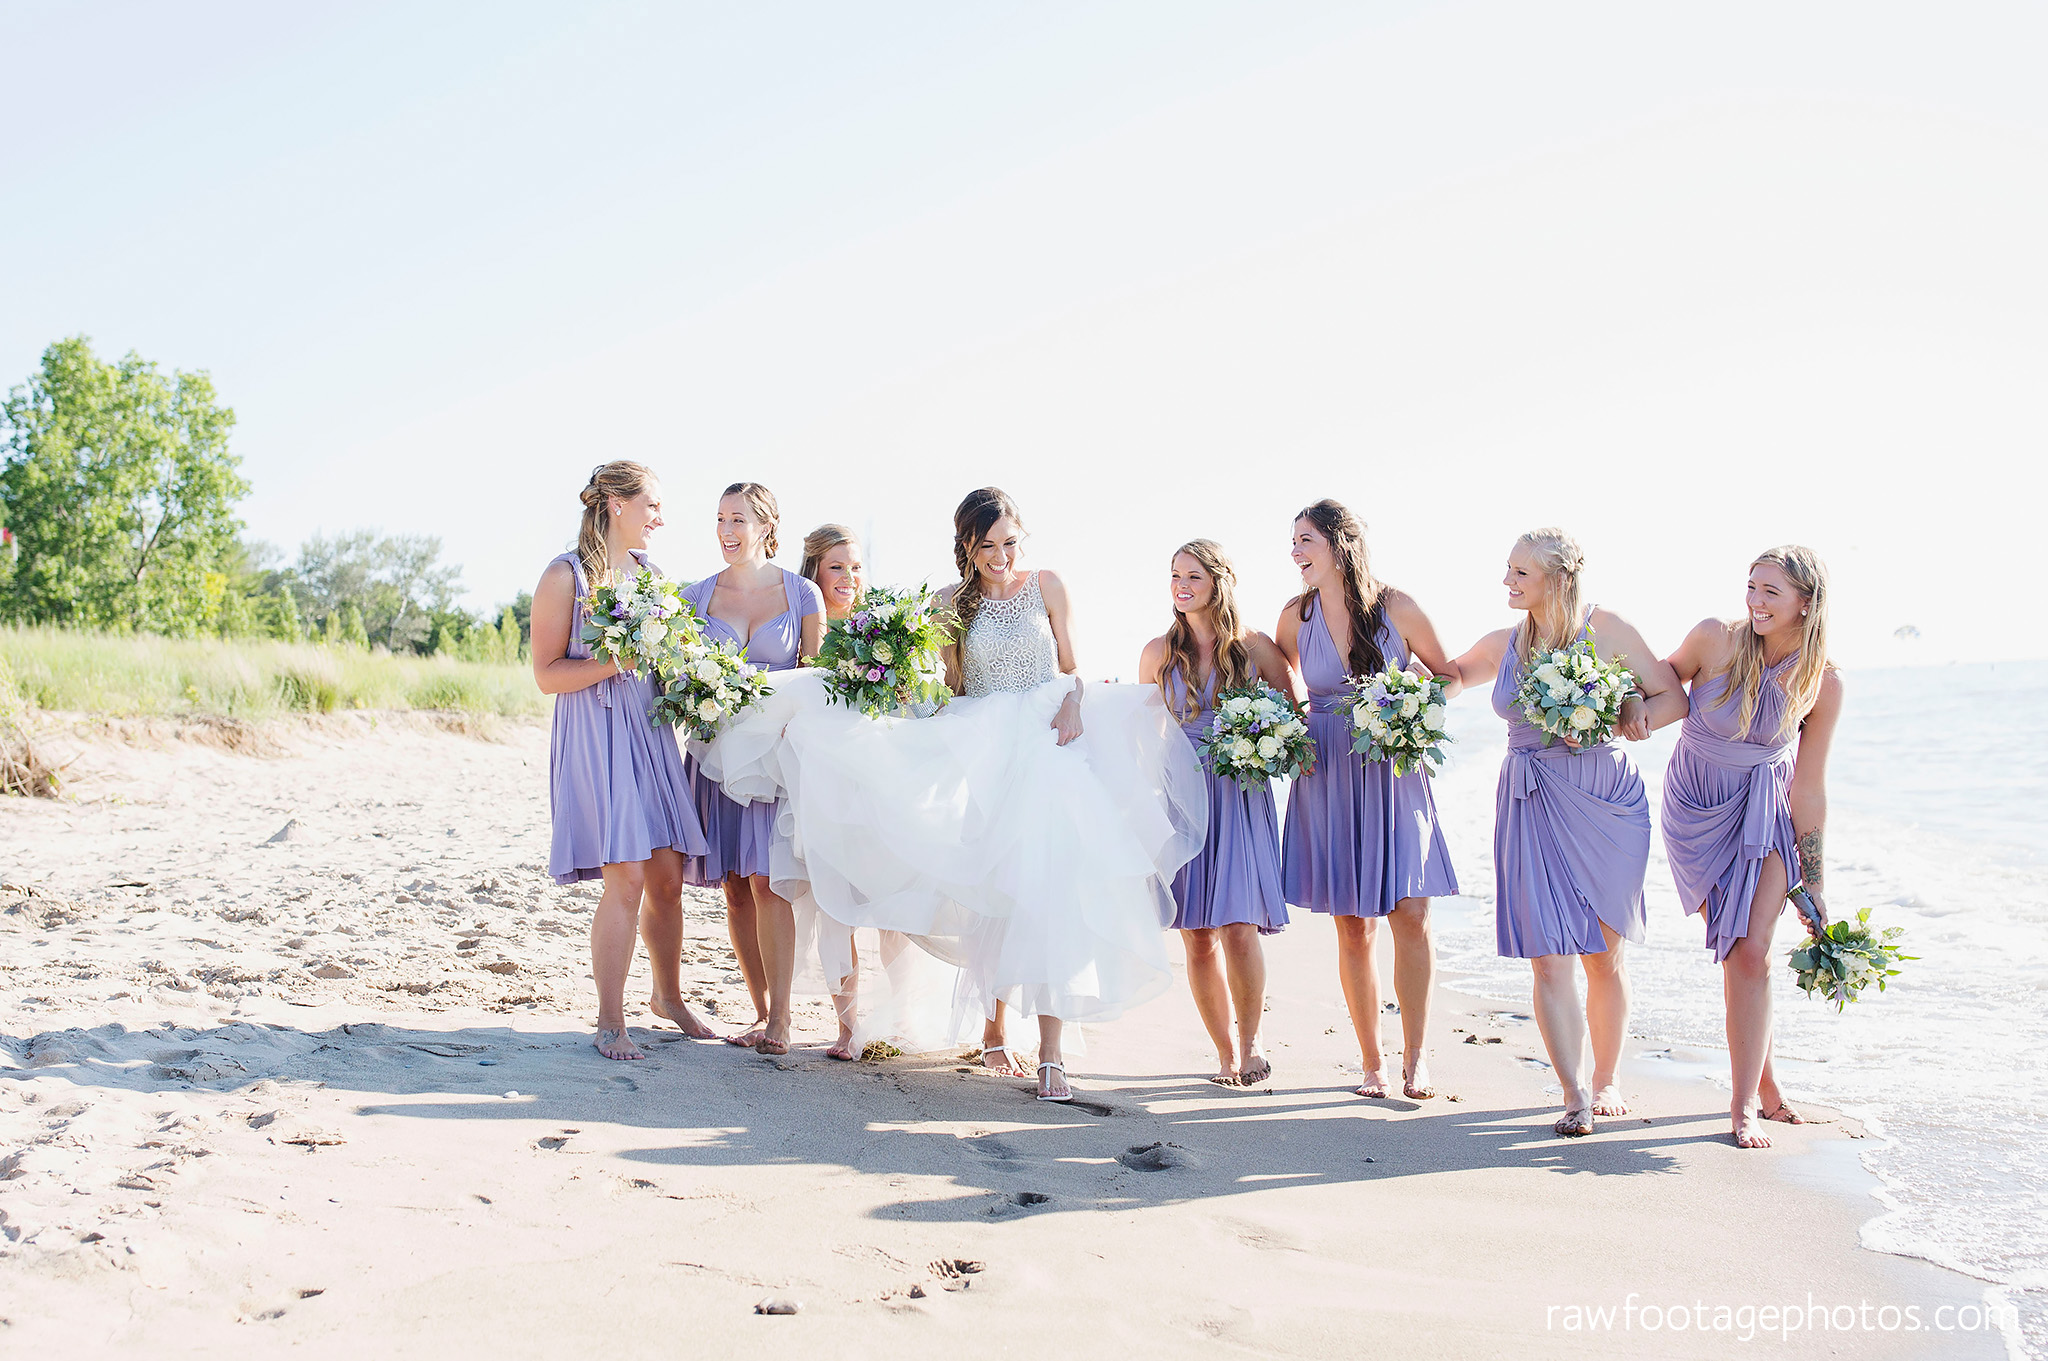 london_ontario_wedding_photographer-grand_bend_wedding_photographer-oakwood_resort_wedding-beach_wedding-sunset_wedding-raw_footage_photography059.jpg